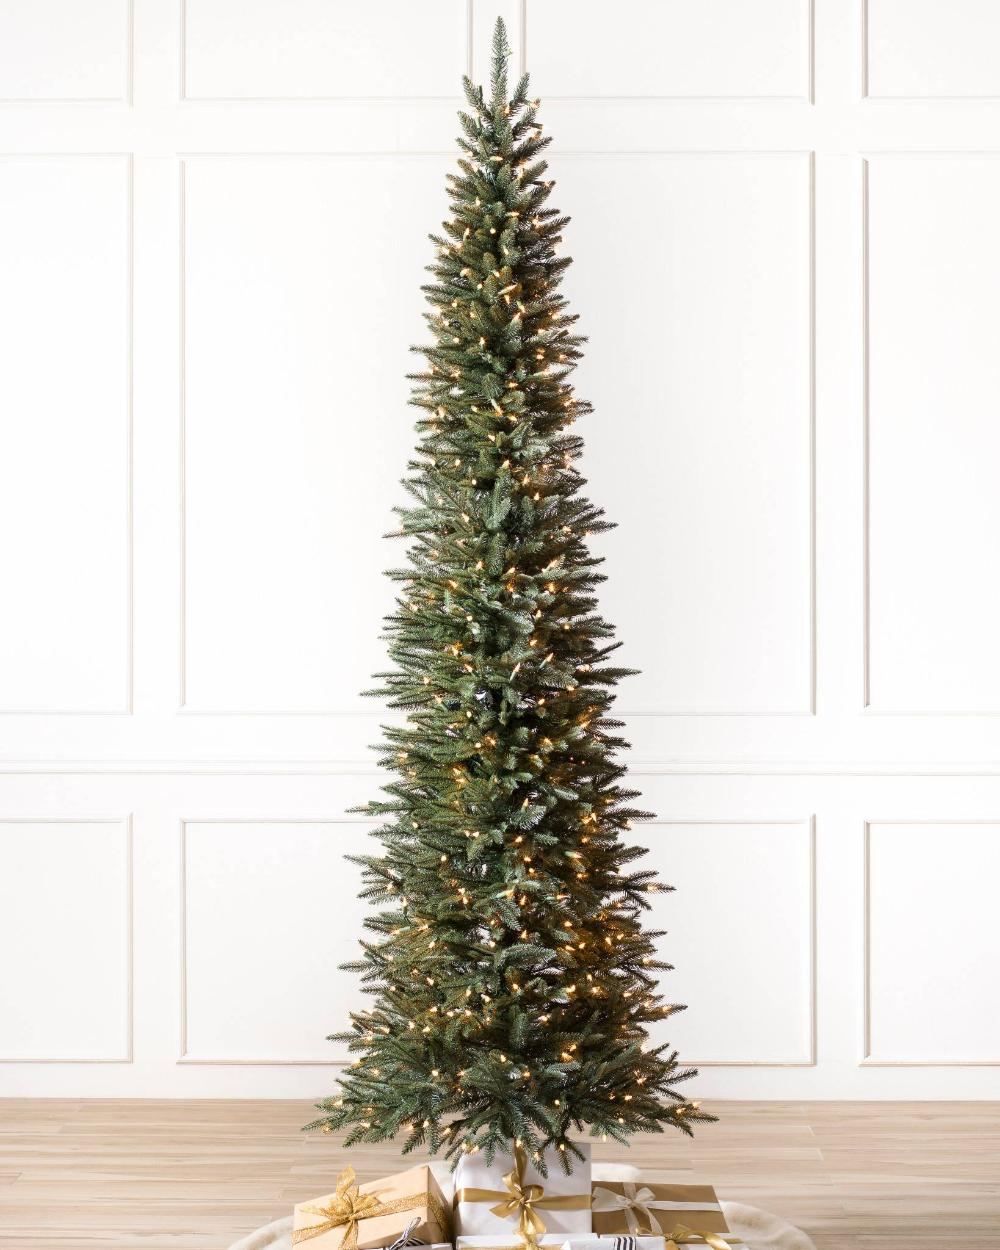 Revelstoke Downswept Fir Artificial Christmas Tree Balsam Hill Slim Artificial Christmas Trees Artificial Christmas Tree Christmas Tree